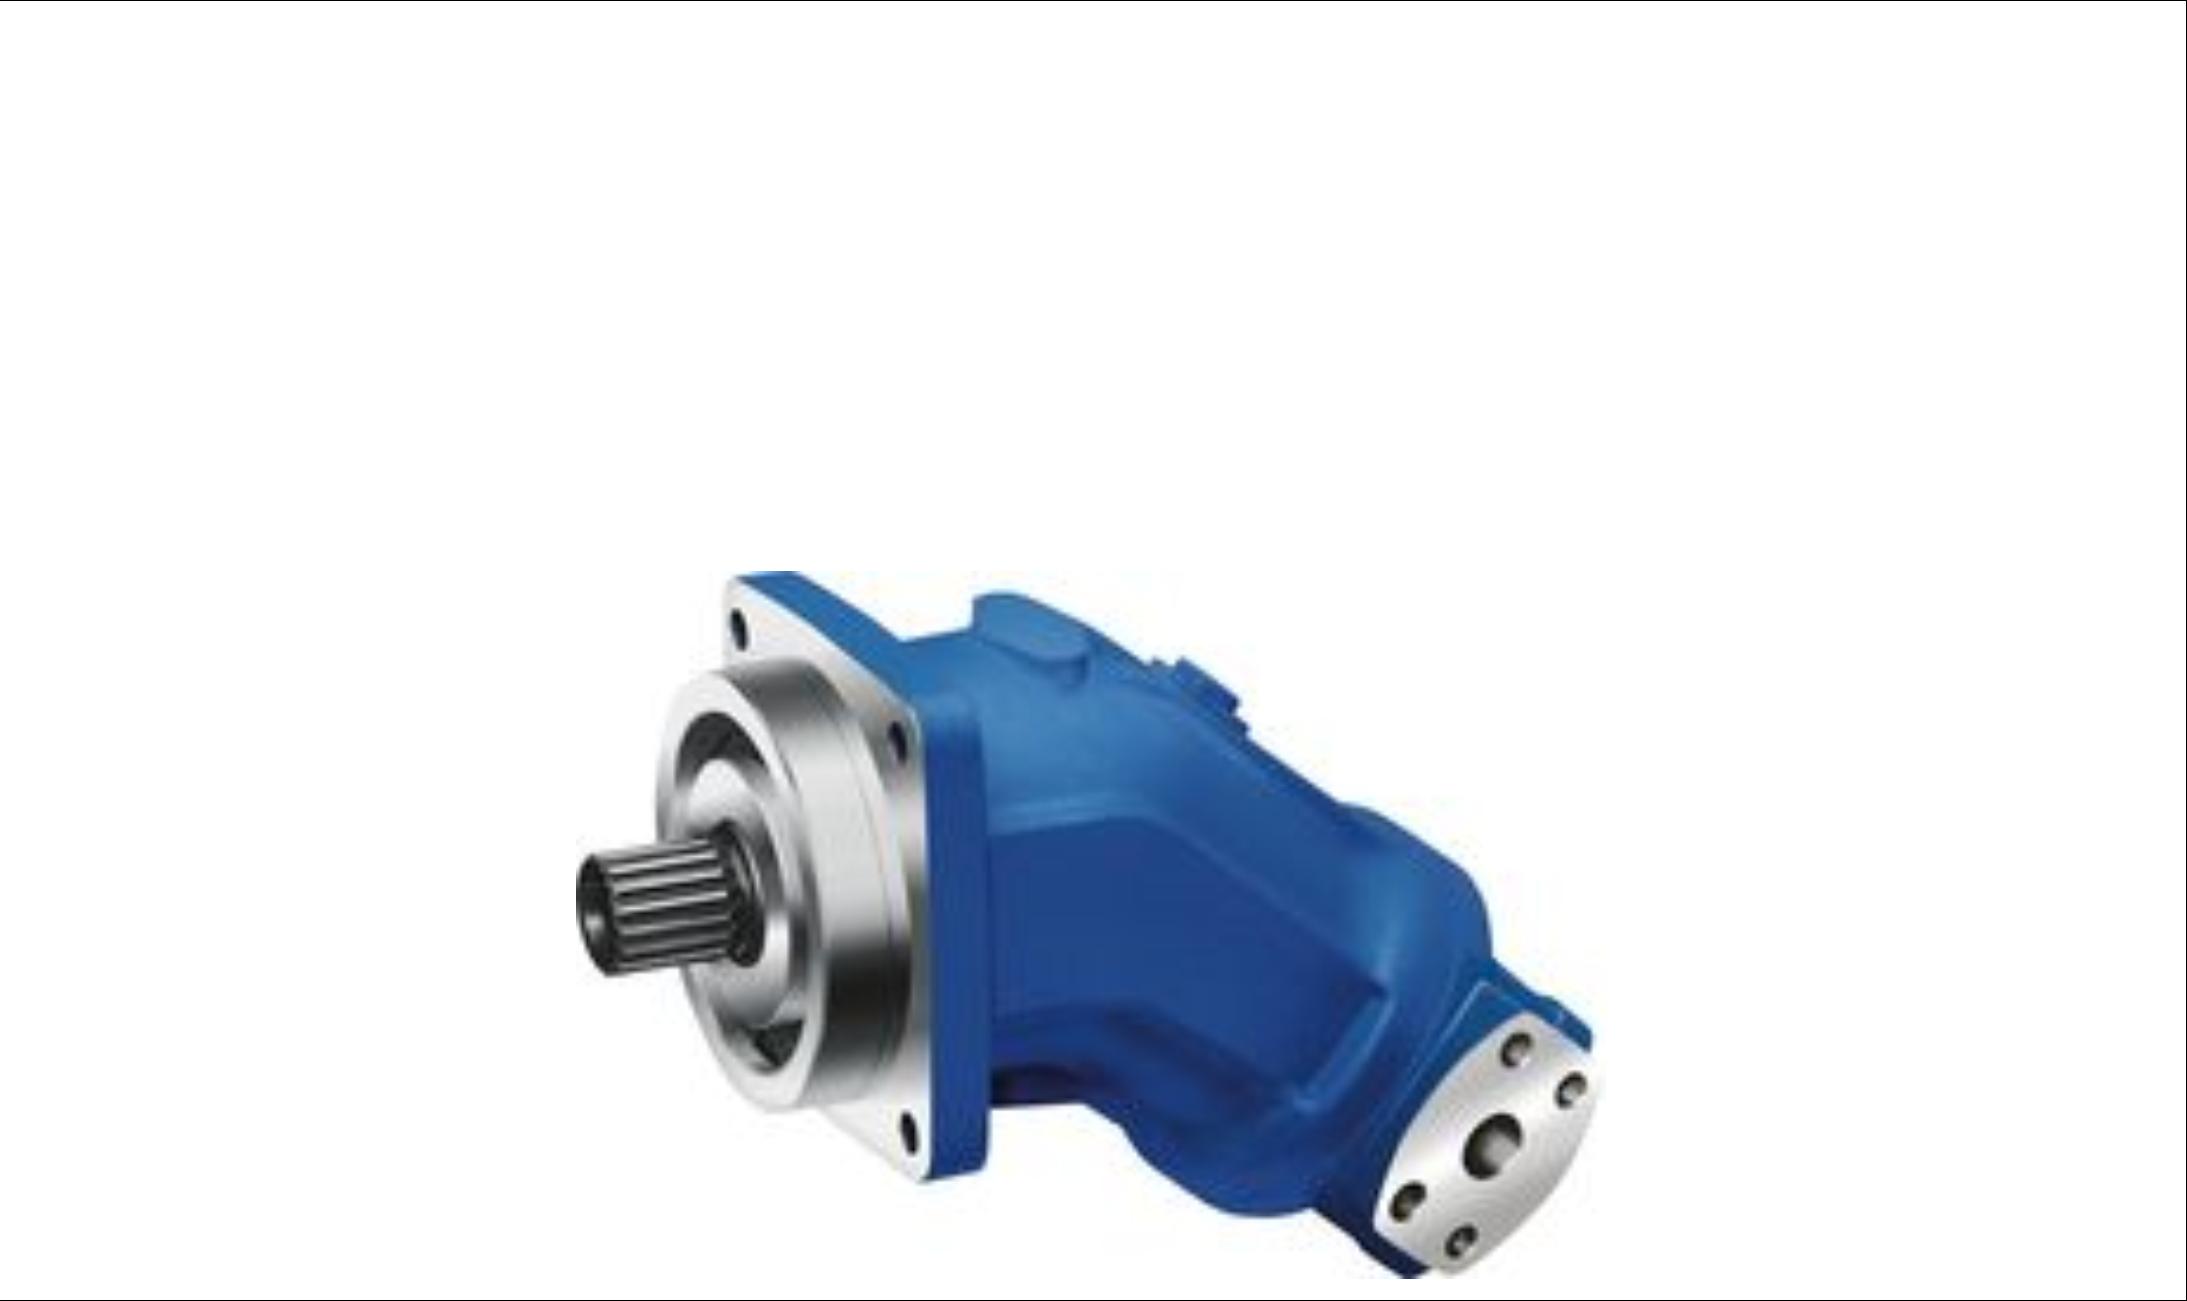 Hydraulic Piston Pump : Rexroth hydraulic piston pumps product catalogue perth